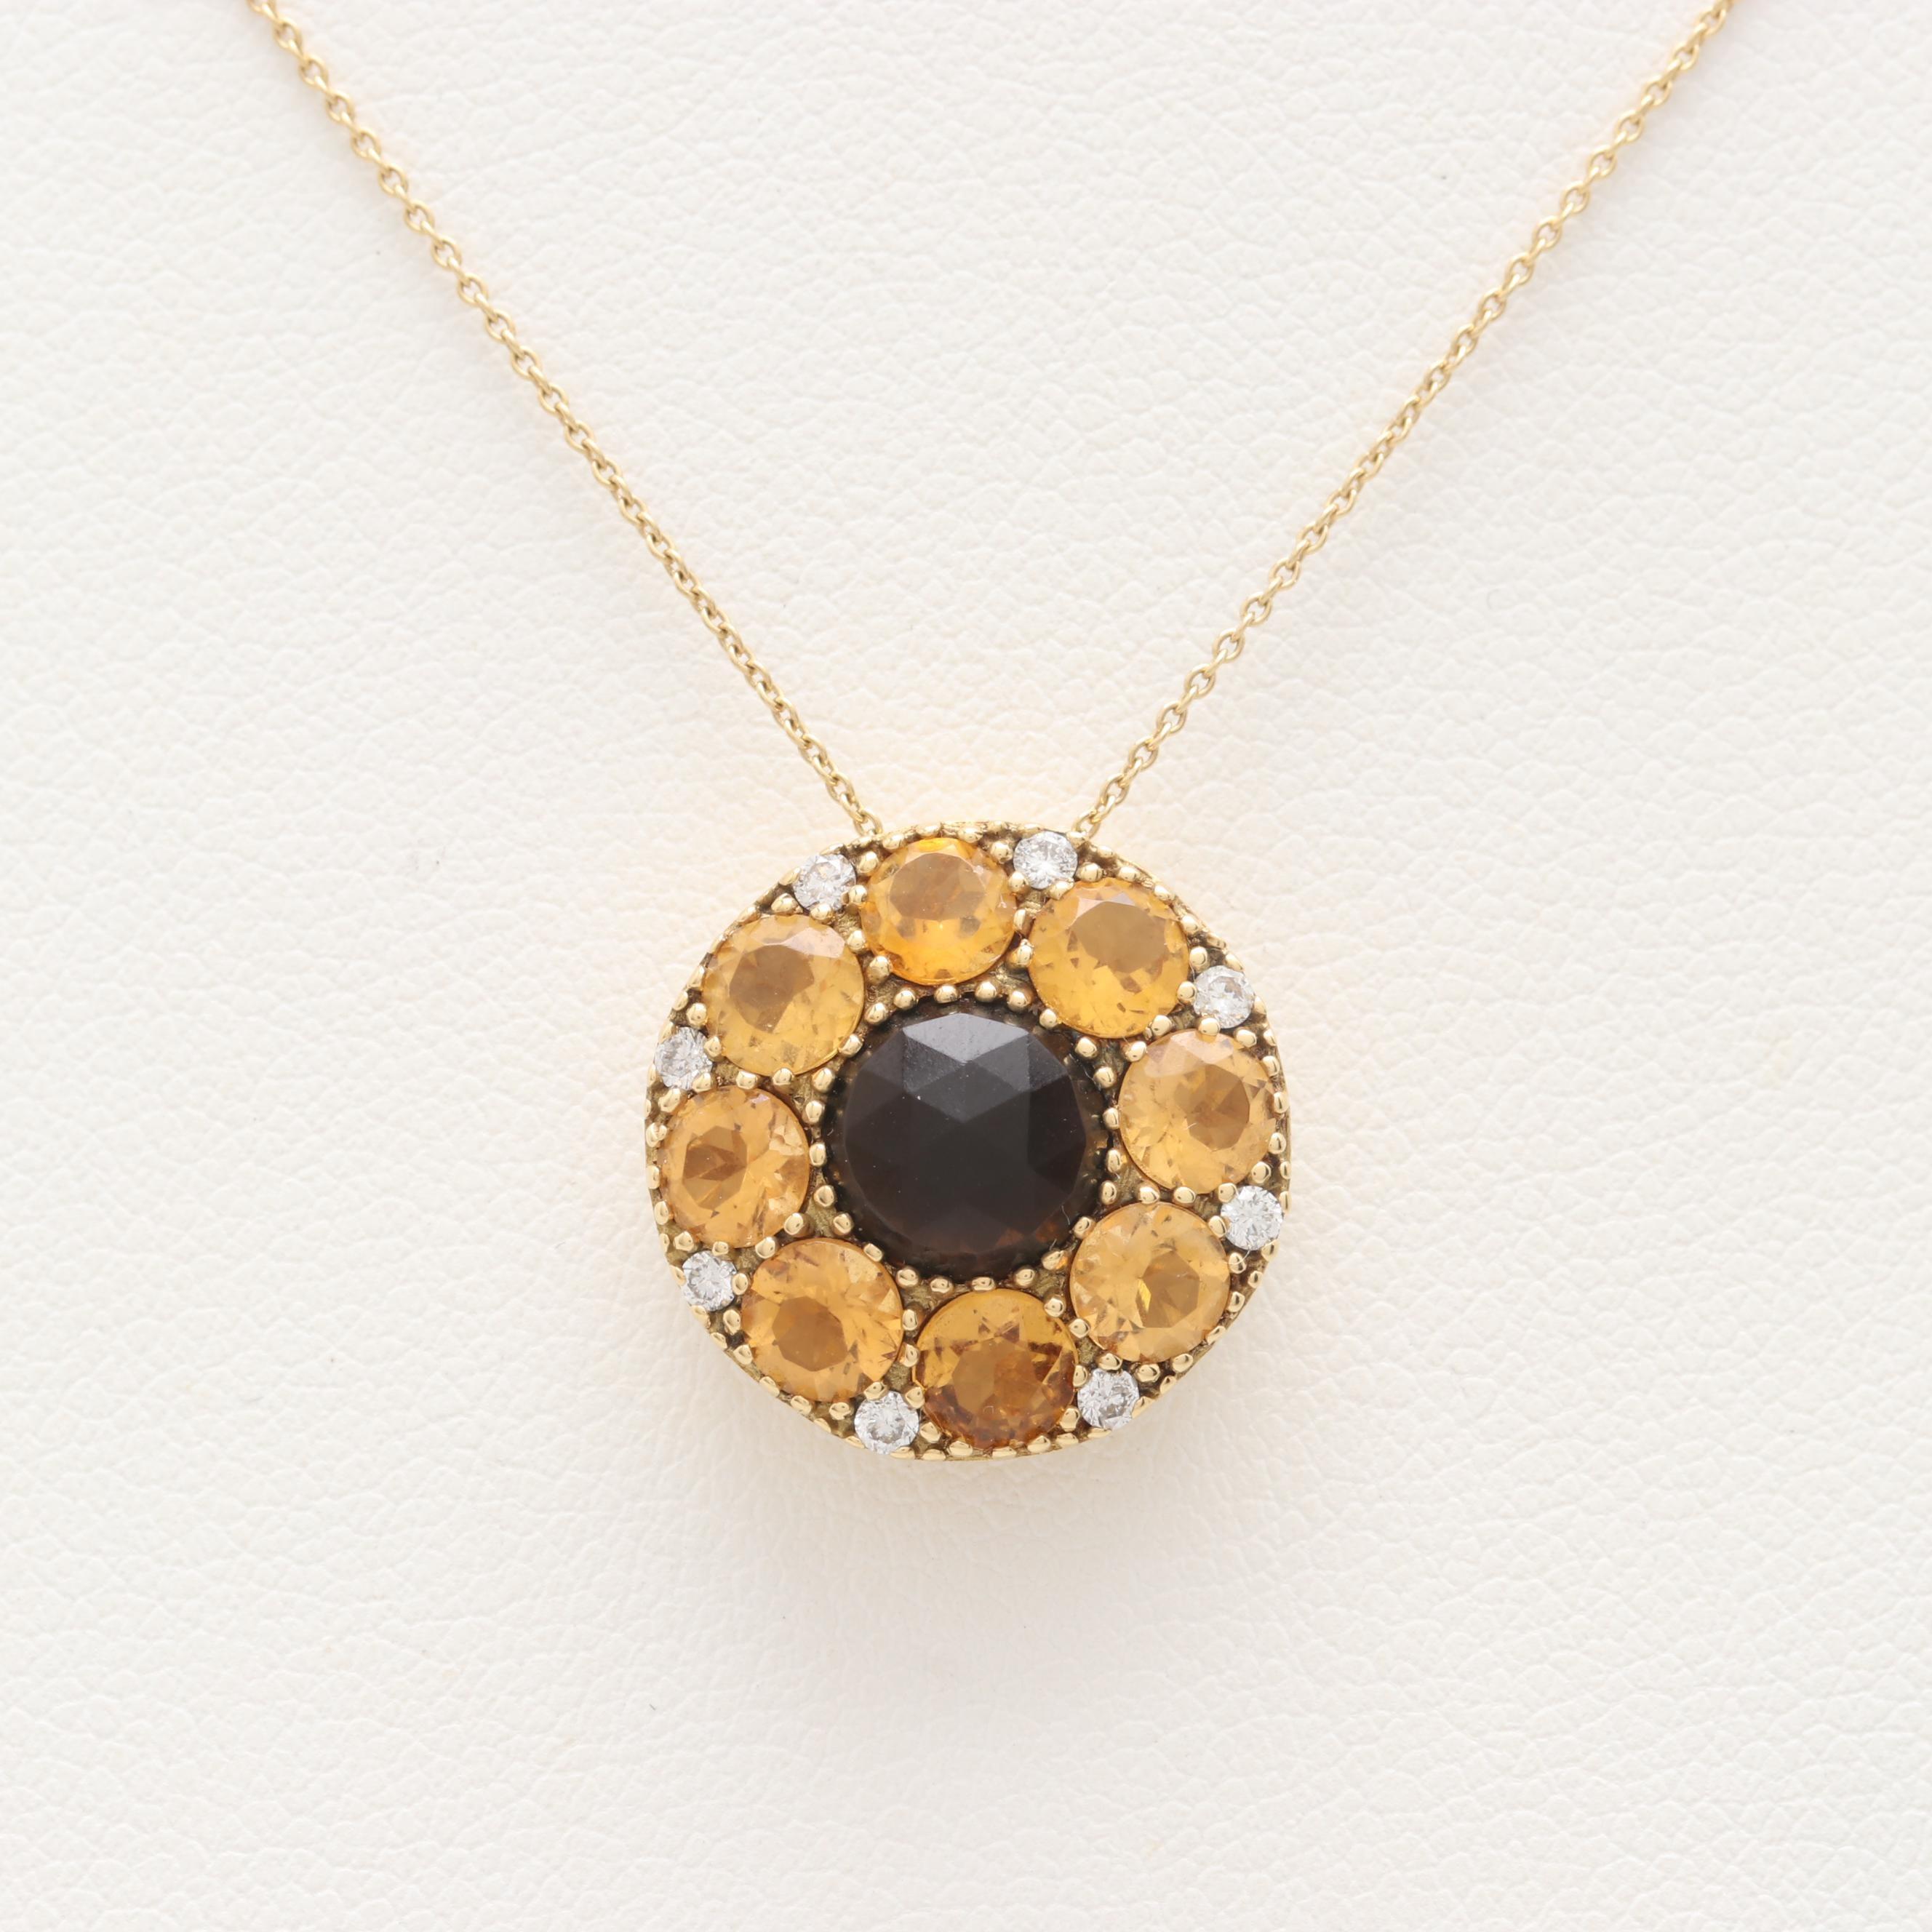 18K Yellow Gold Smoky Quartz, Citrine and Diamond Necklace